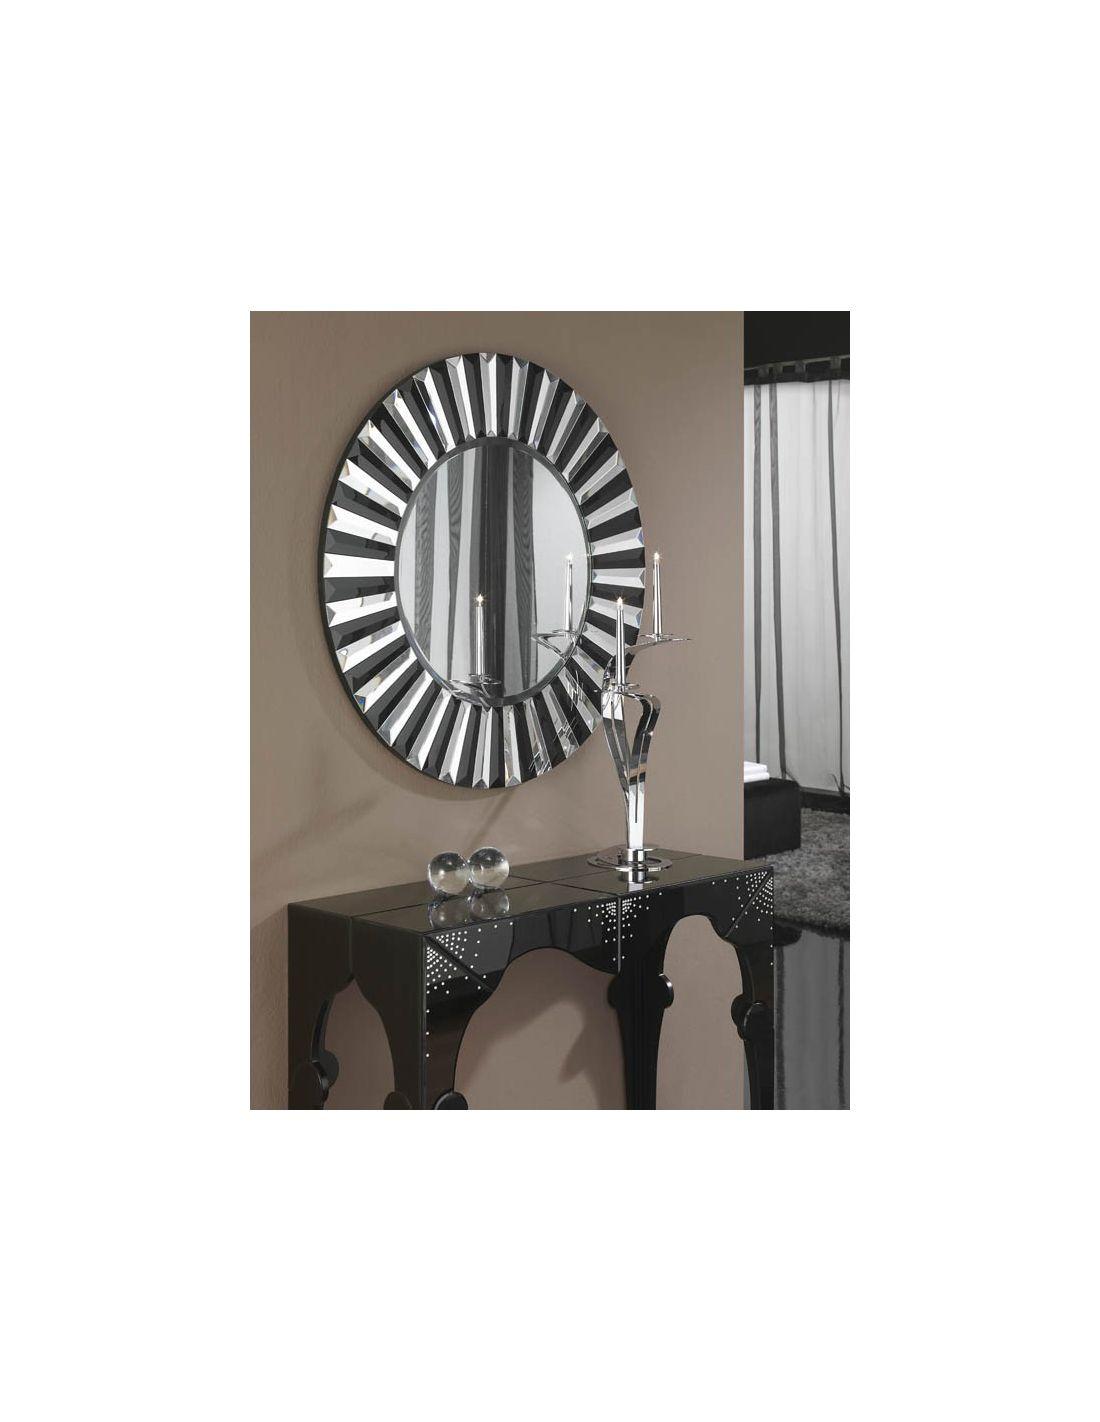 Espejos redondos espejo redondo decoracin flor oro cm for Espejos de madera redondos